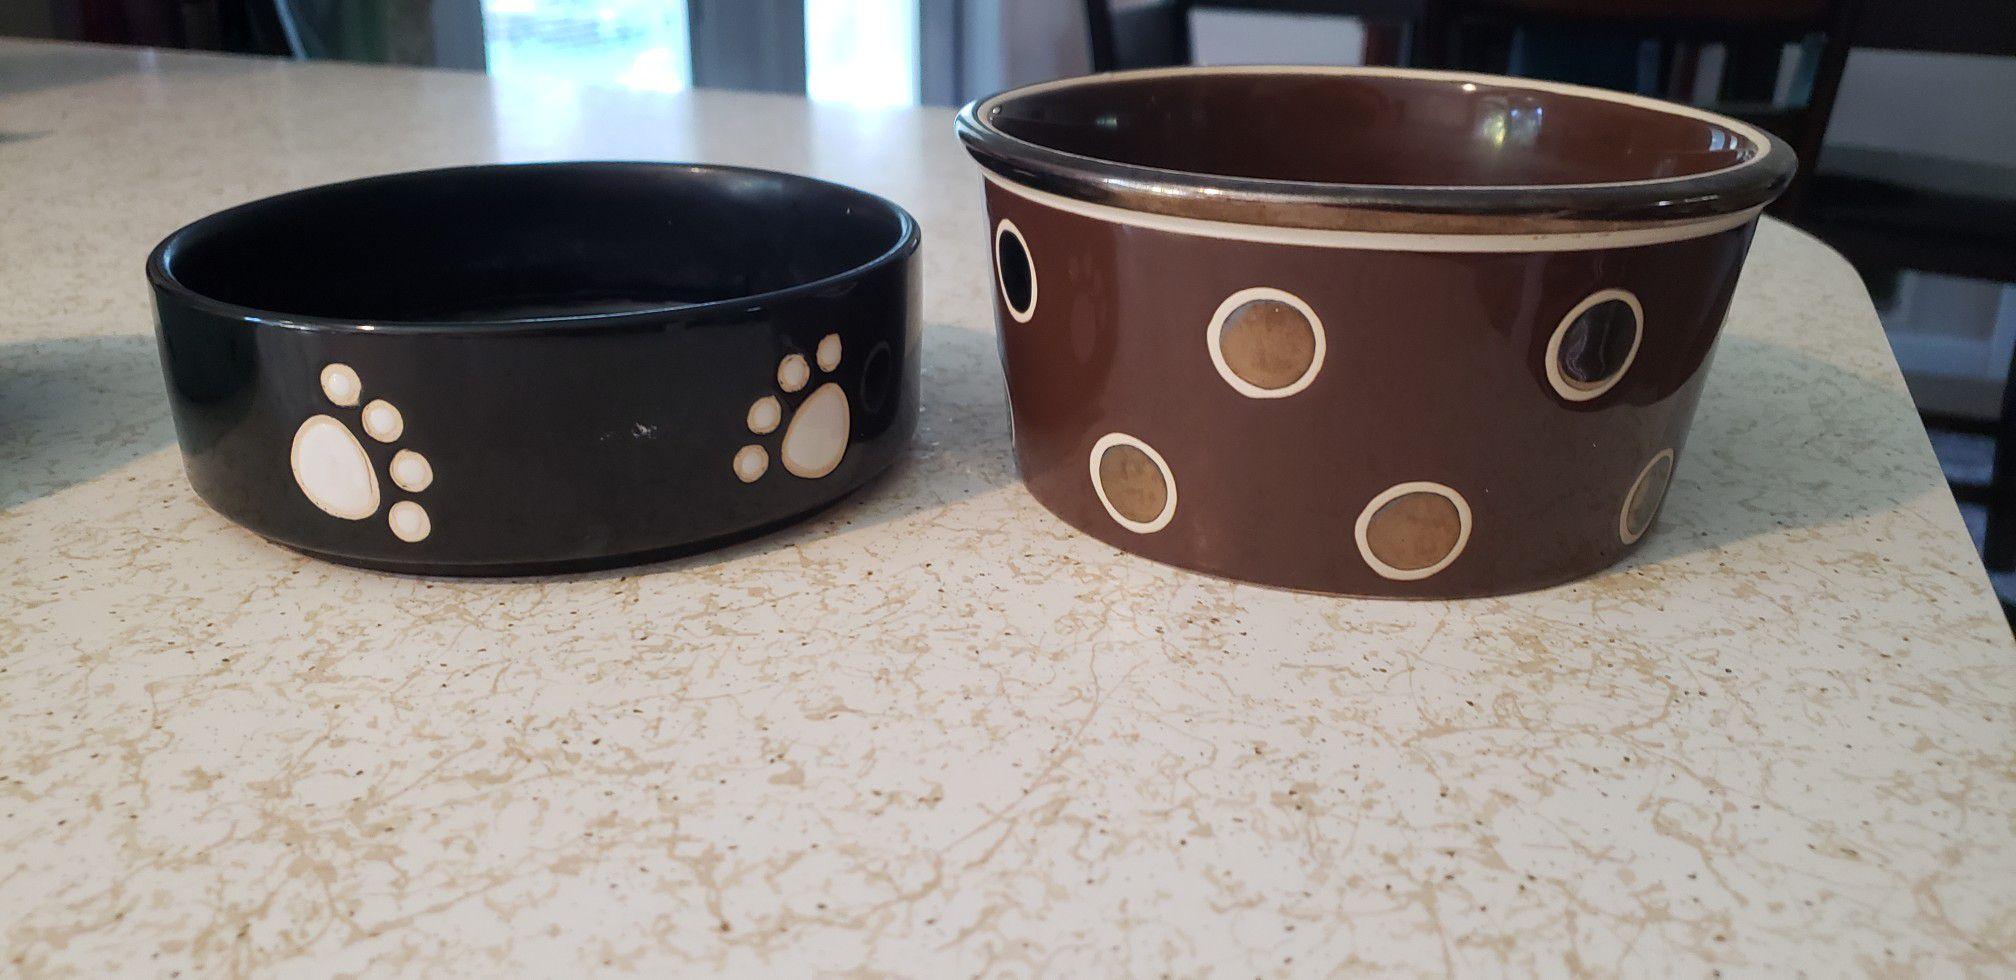 Cute dog food and water ceramic bowls